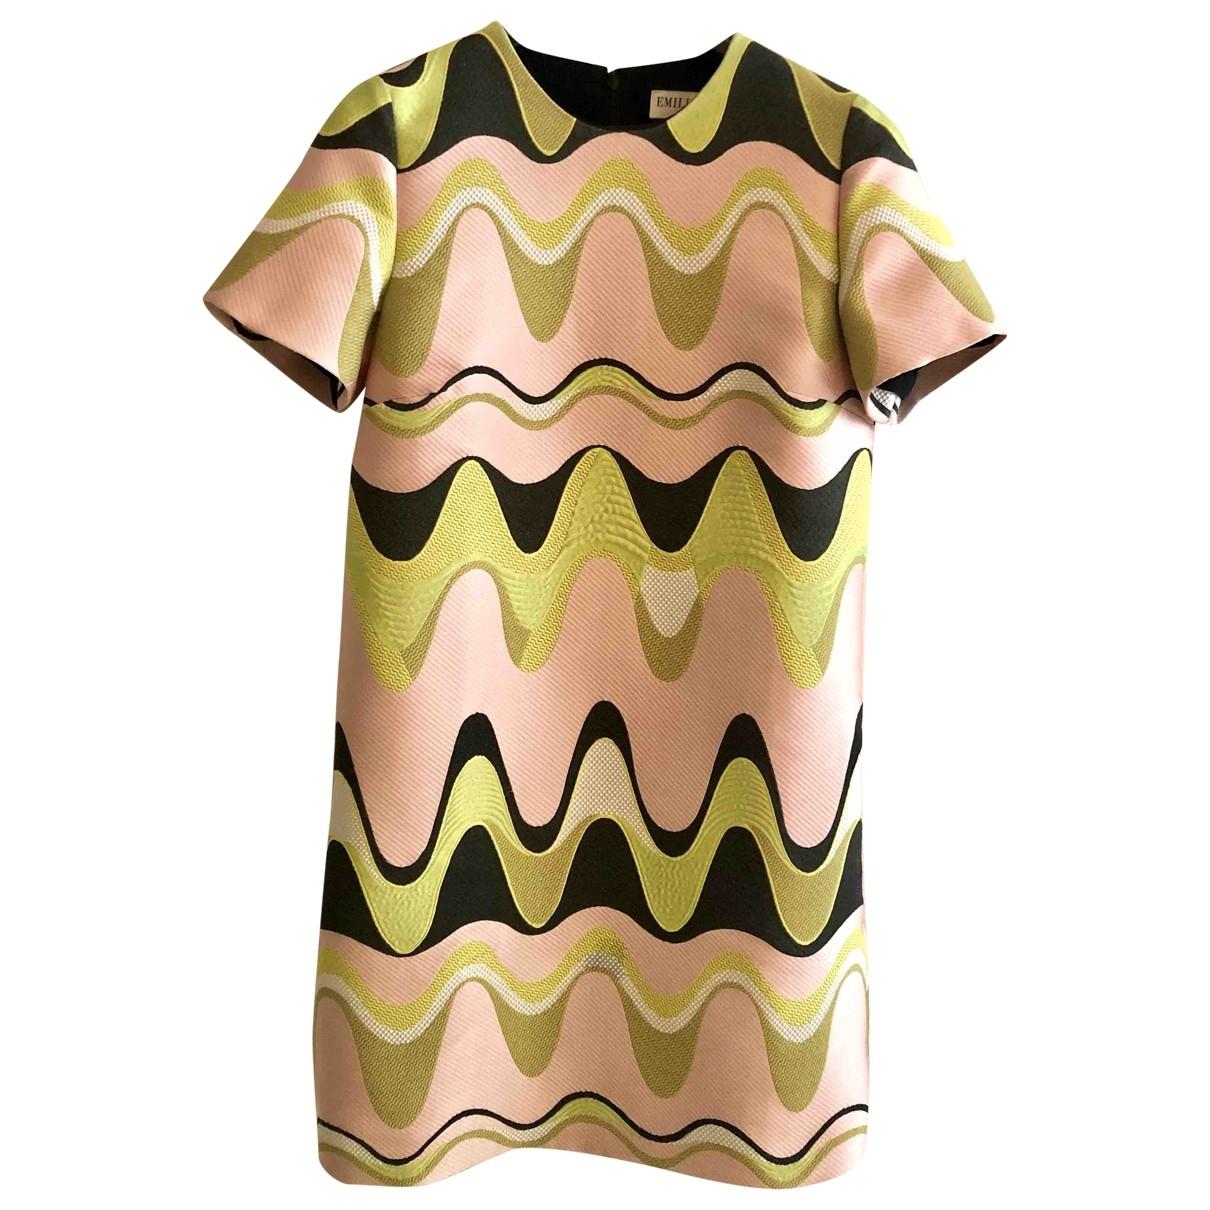 Emilio Pucci \N Kleid in  Bunt Polyester